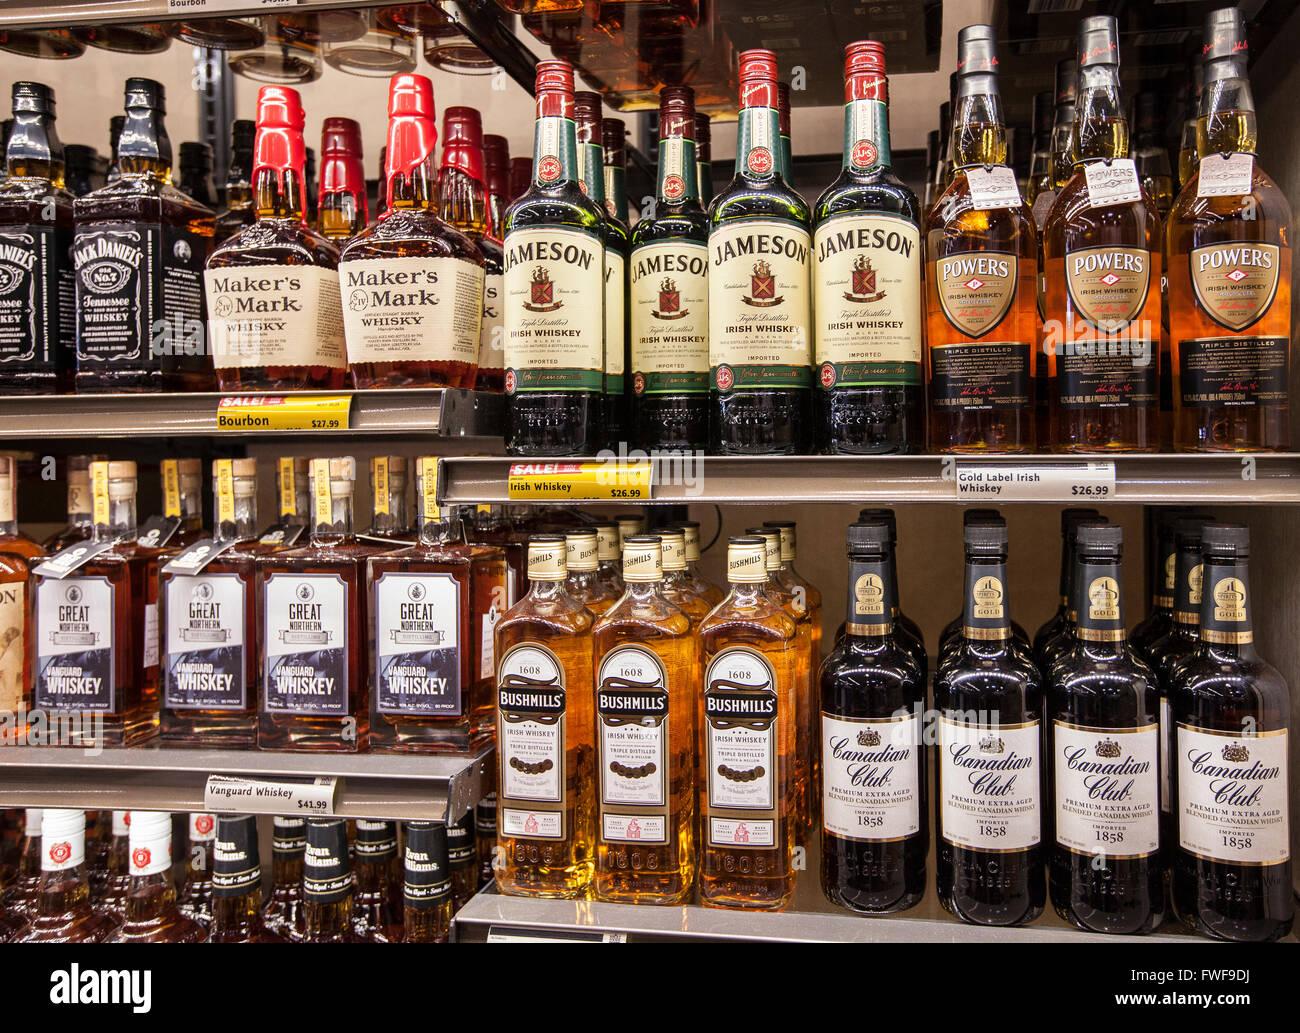 Bottles Of Alcohol On The Shelves Of A Liquor Store Stock